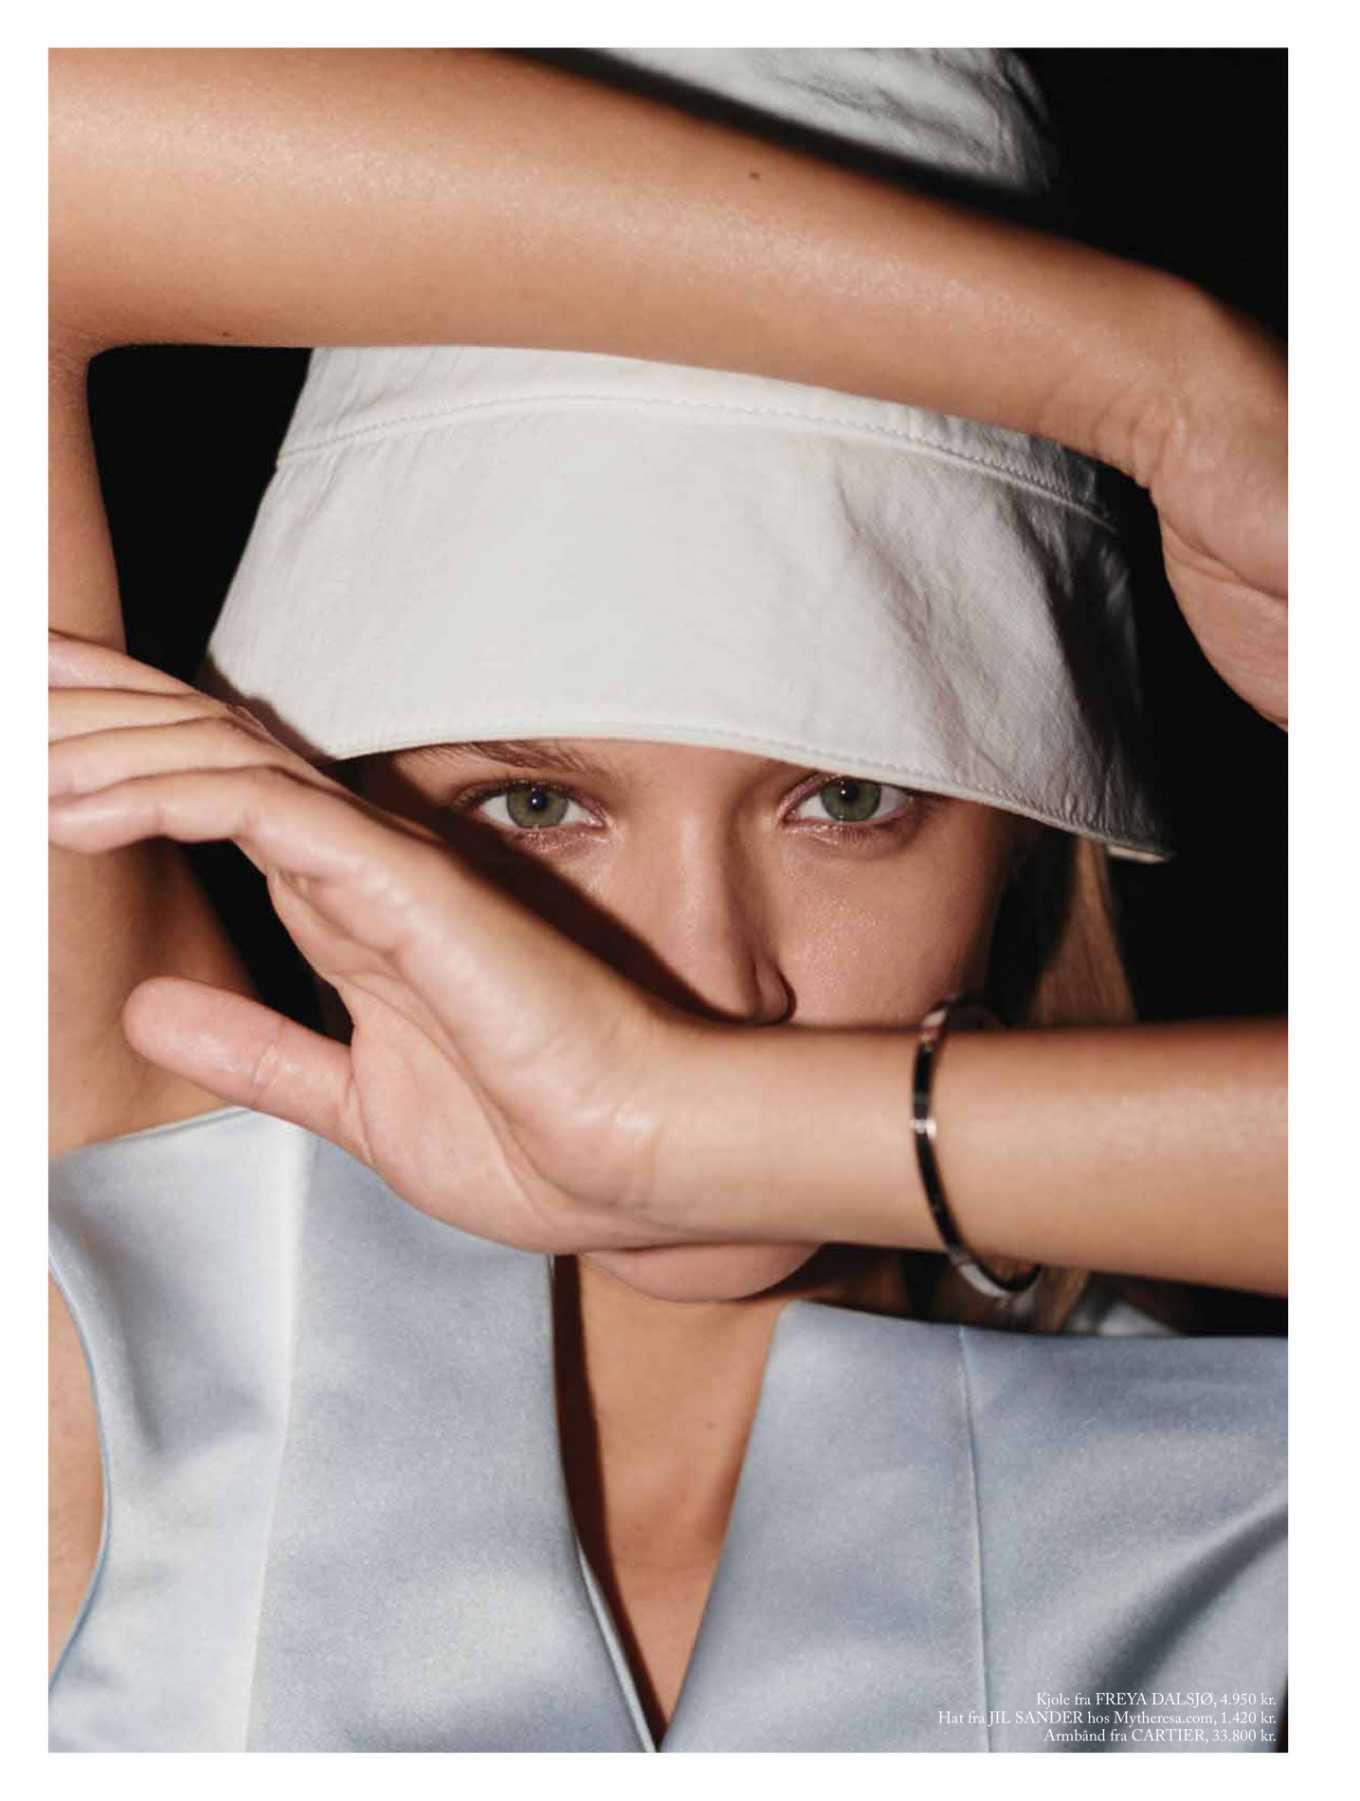 Josephine Skriver 2020 : Josephine Skriver – Eurowoman Magazine 2020-12